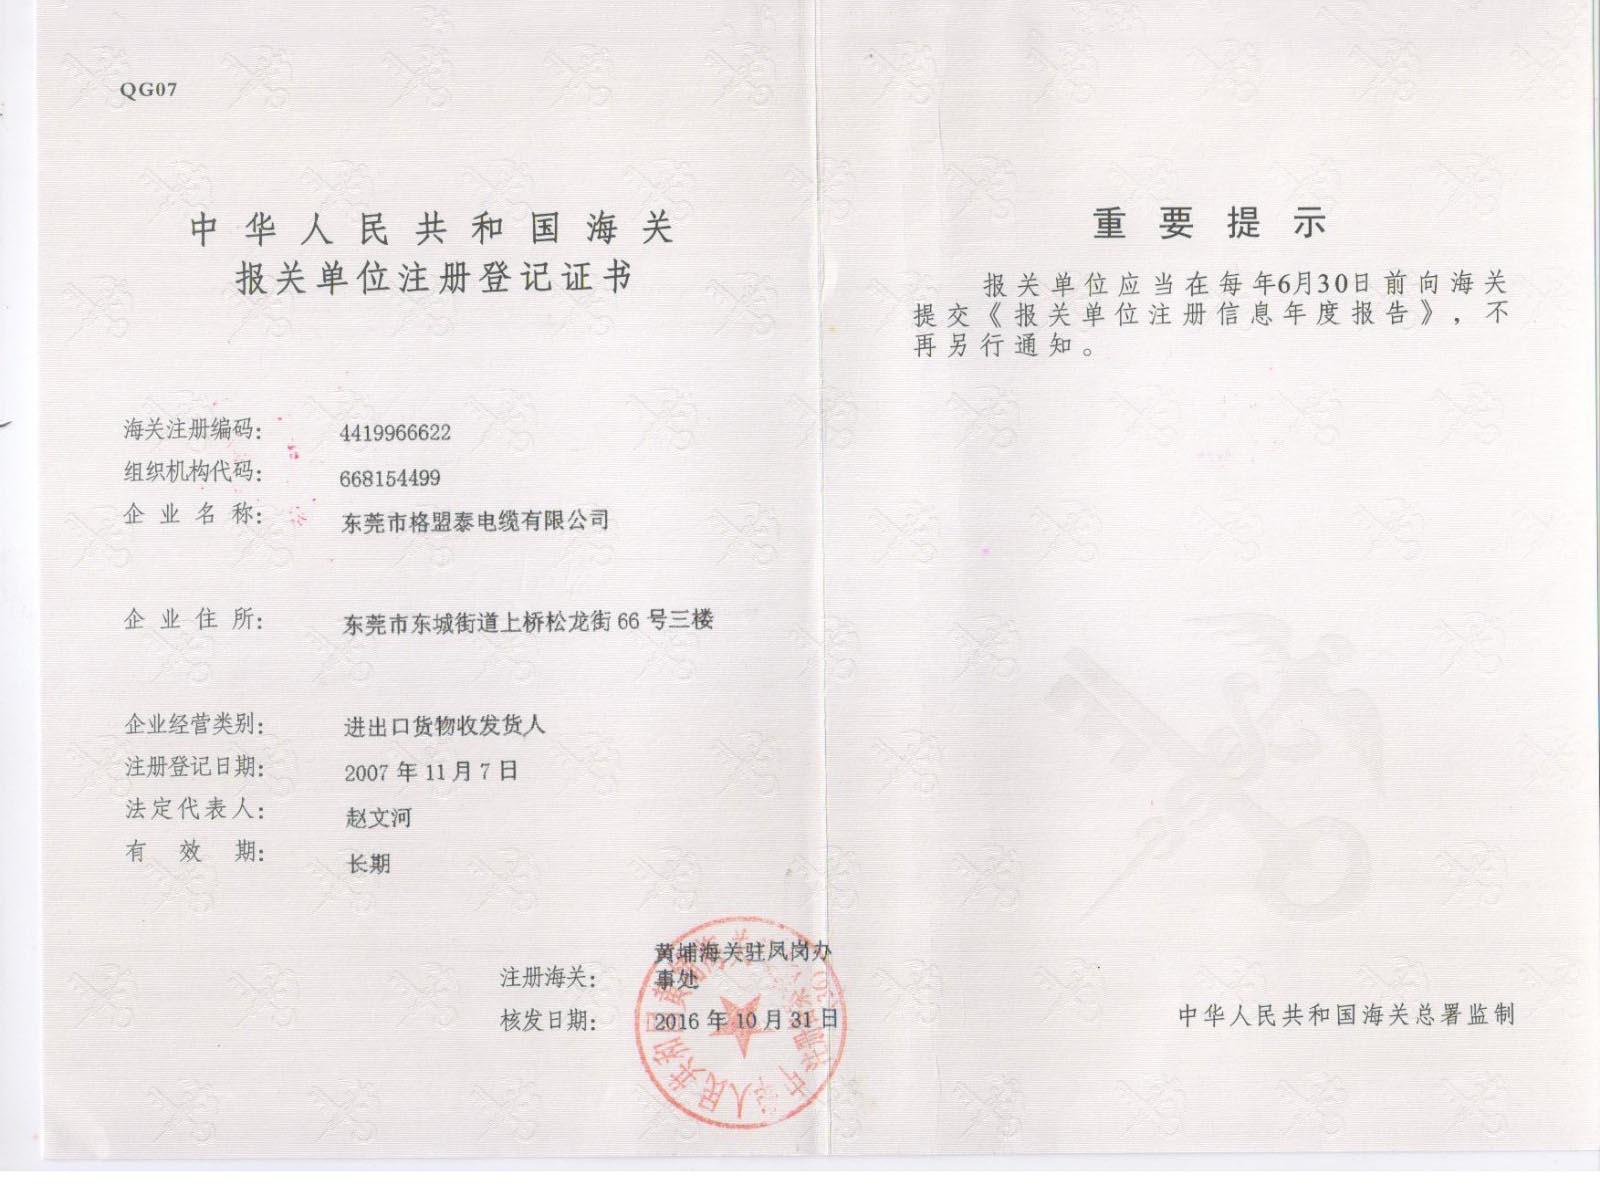 Dongguan Company Customs Registration Certificate